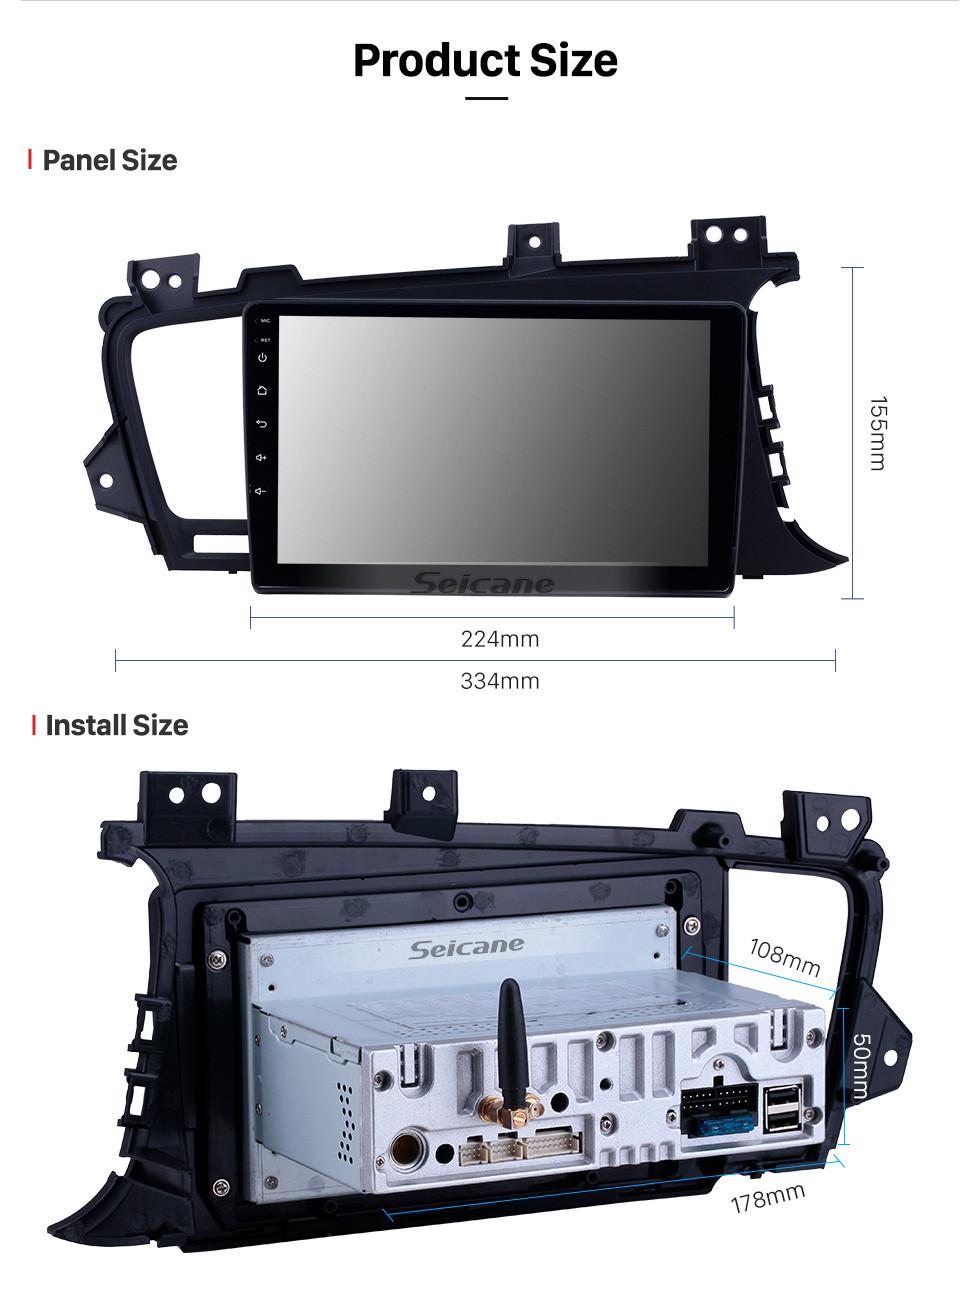 Seicane Android 10.0 9 inch GPS Navigation Radio for 2011-2014 Kia K5 RHD with HD Touchscreen Carplay Bluetooth support Digital TV